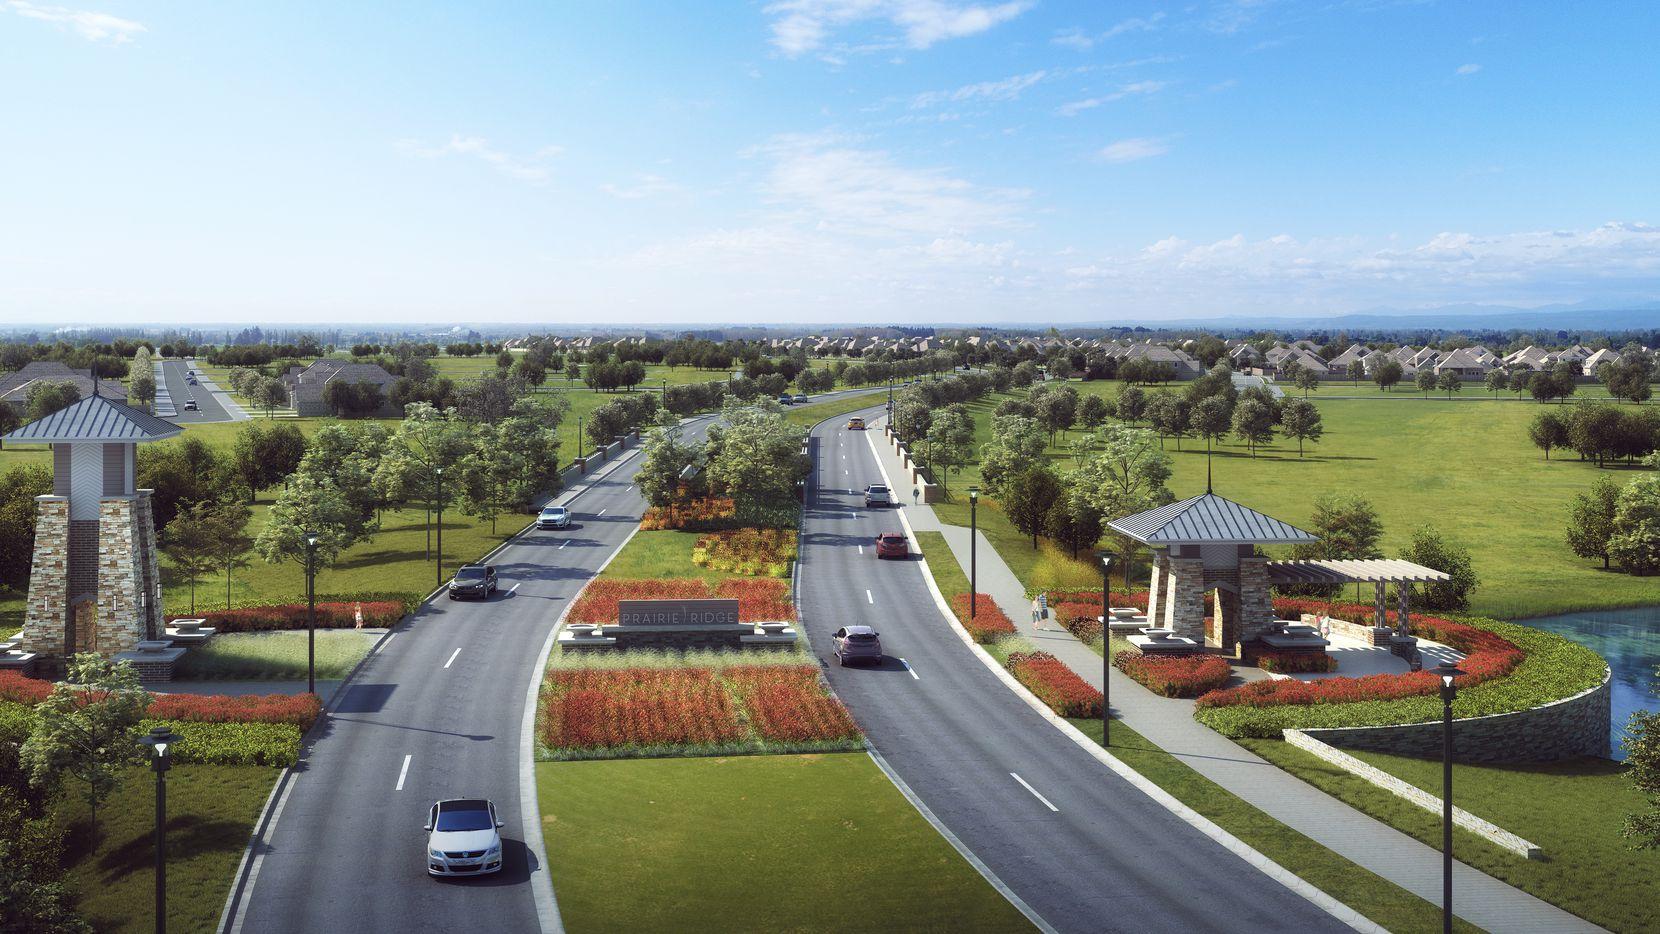 Prairie Ridge will eventually have more than 4,000 homes.